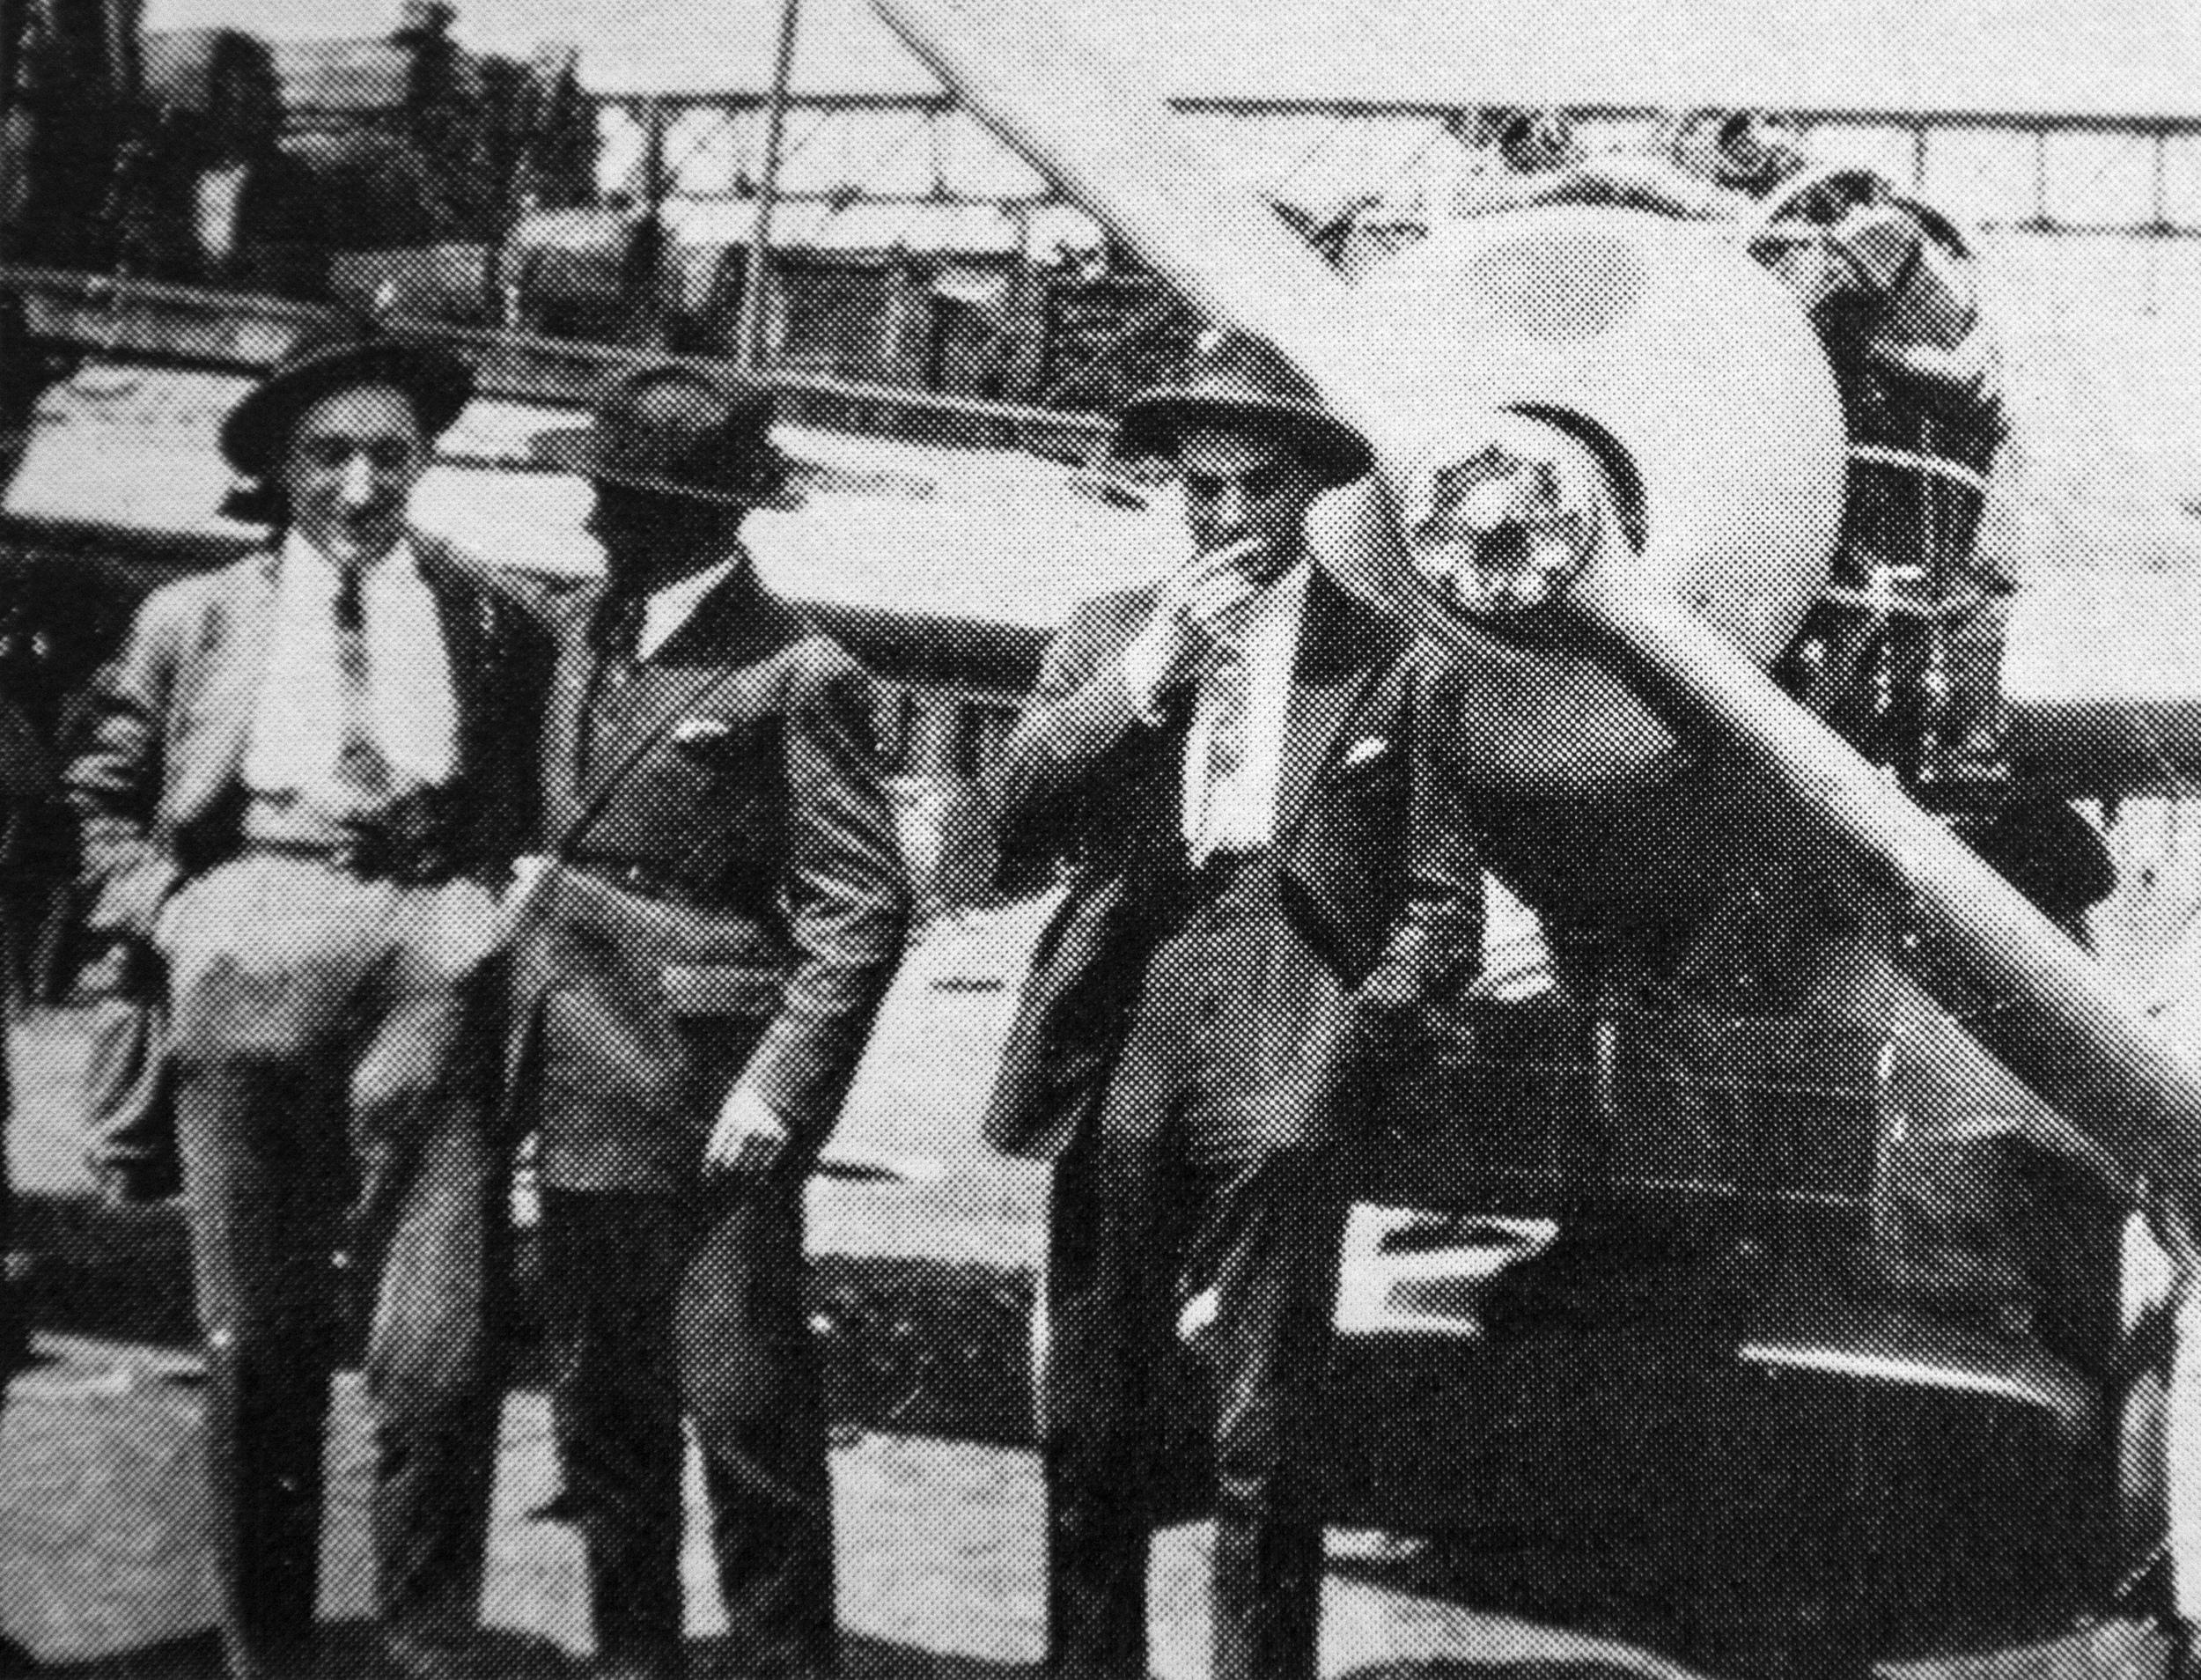 Kartvel (right), Levine and Chagnard